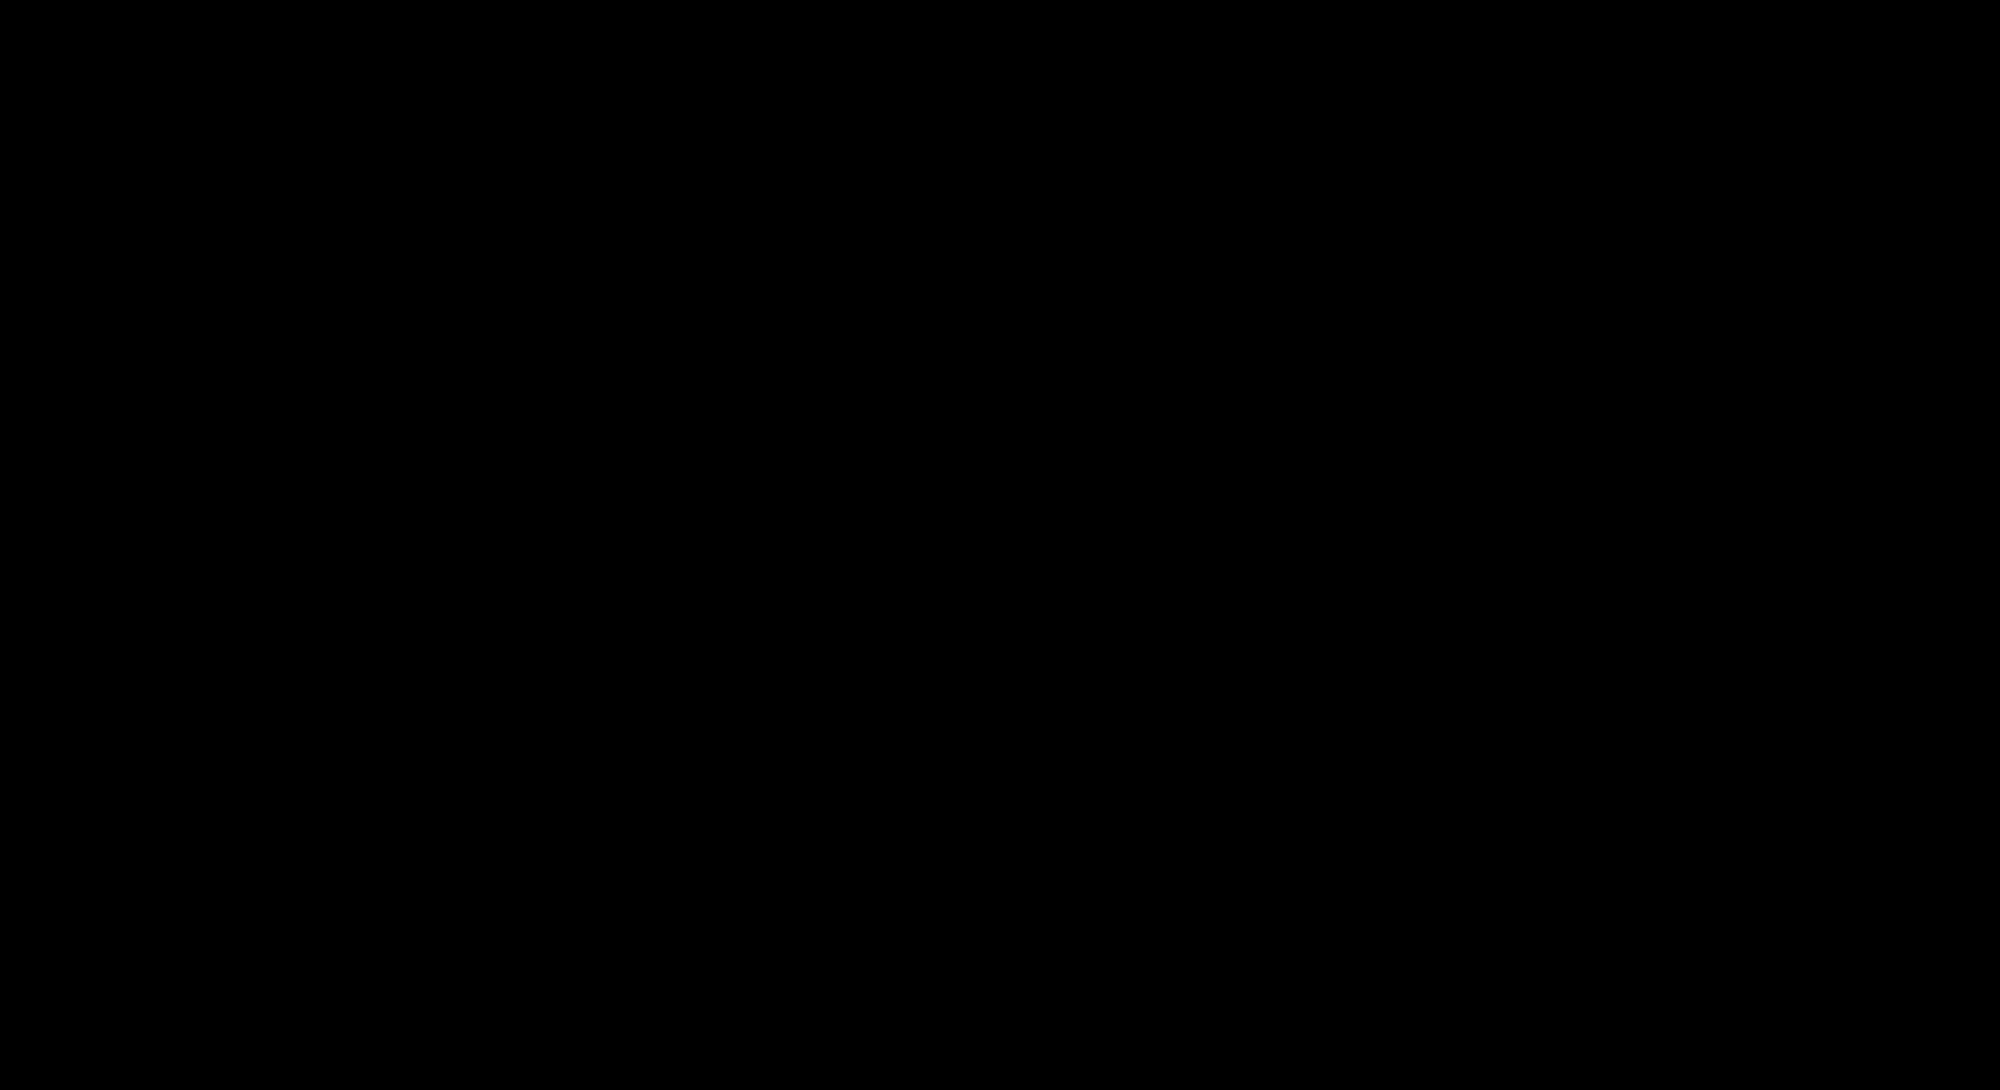 Lex -logo-black.png